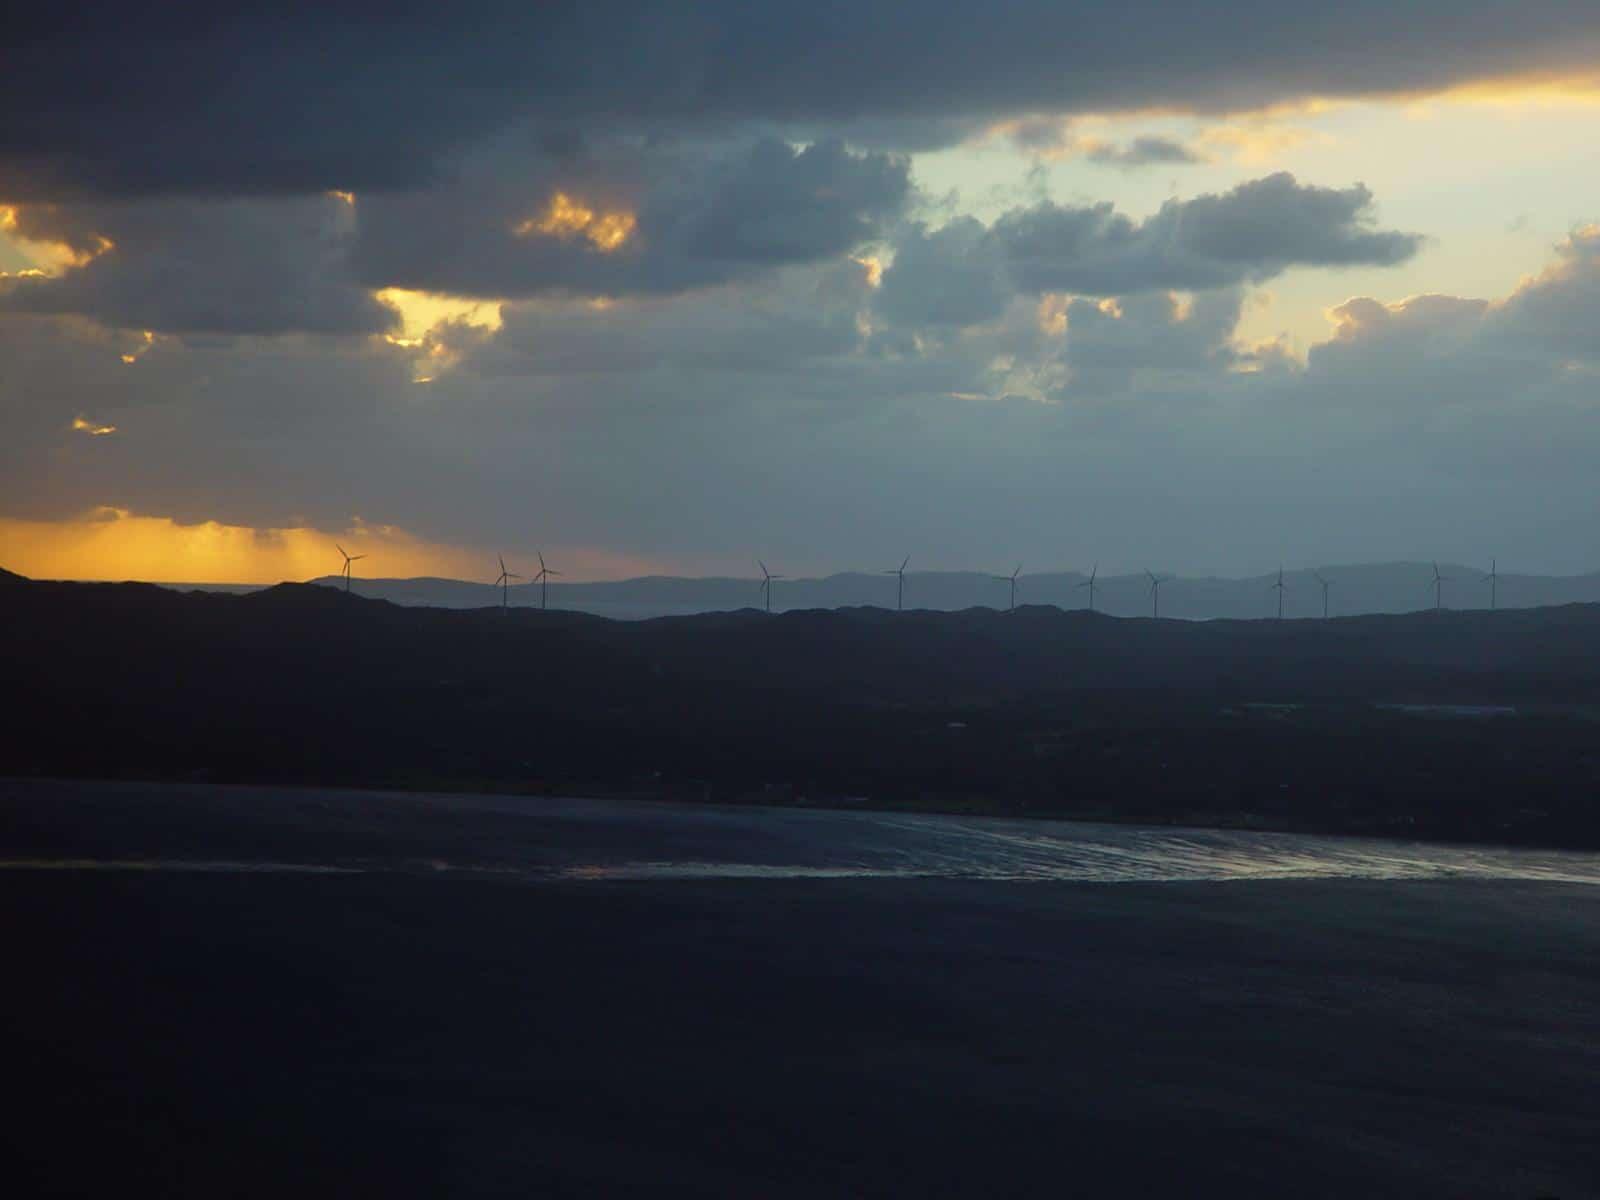 Albany wind-farm against the sunset, Western Australia